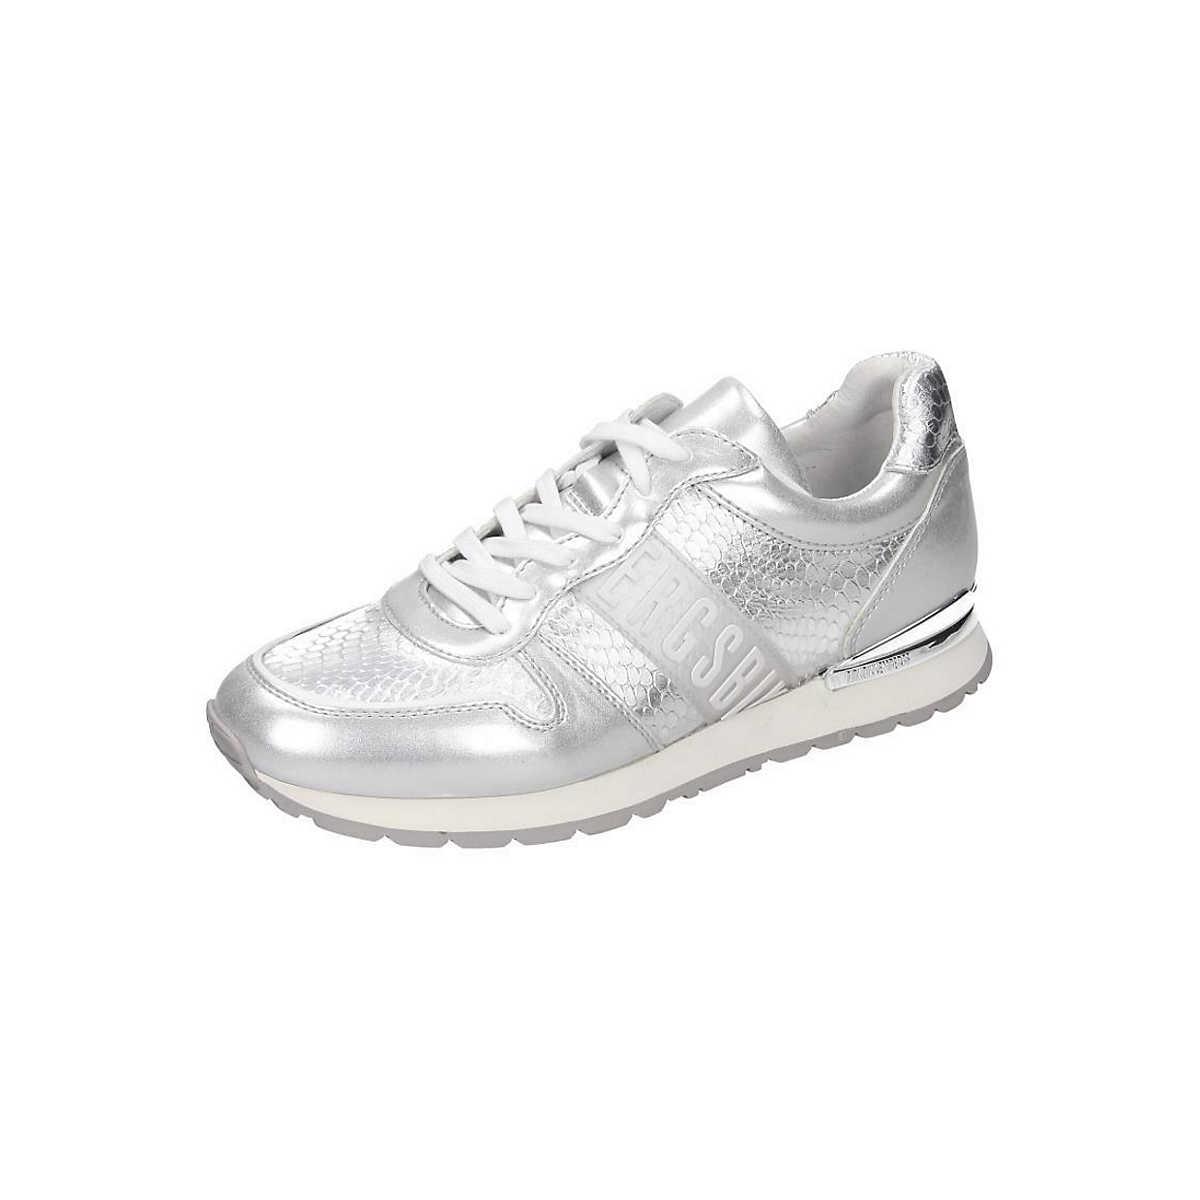 Bikkembergs Sneakers silber - Bikkembergs - Sneakers - Schuhe - mirapodo.de